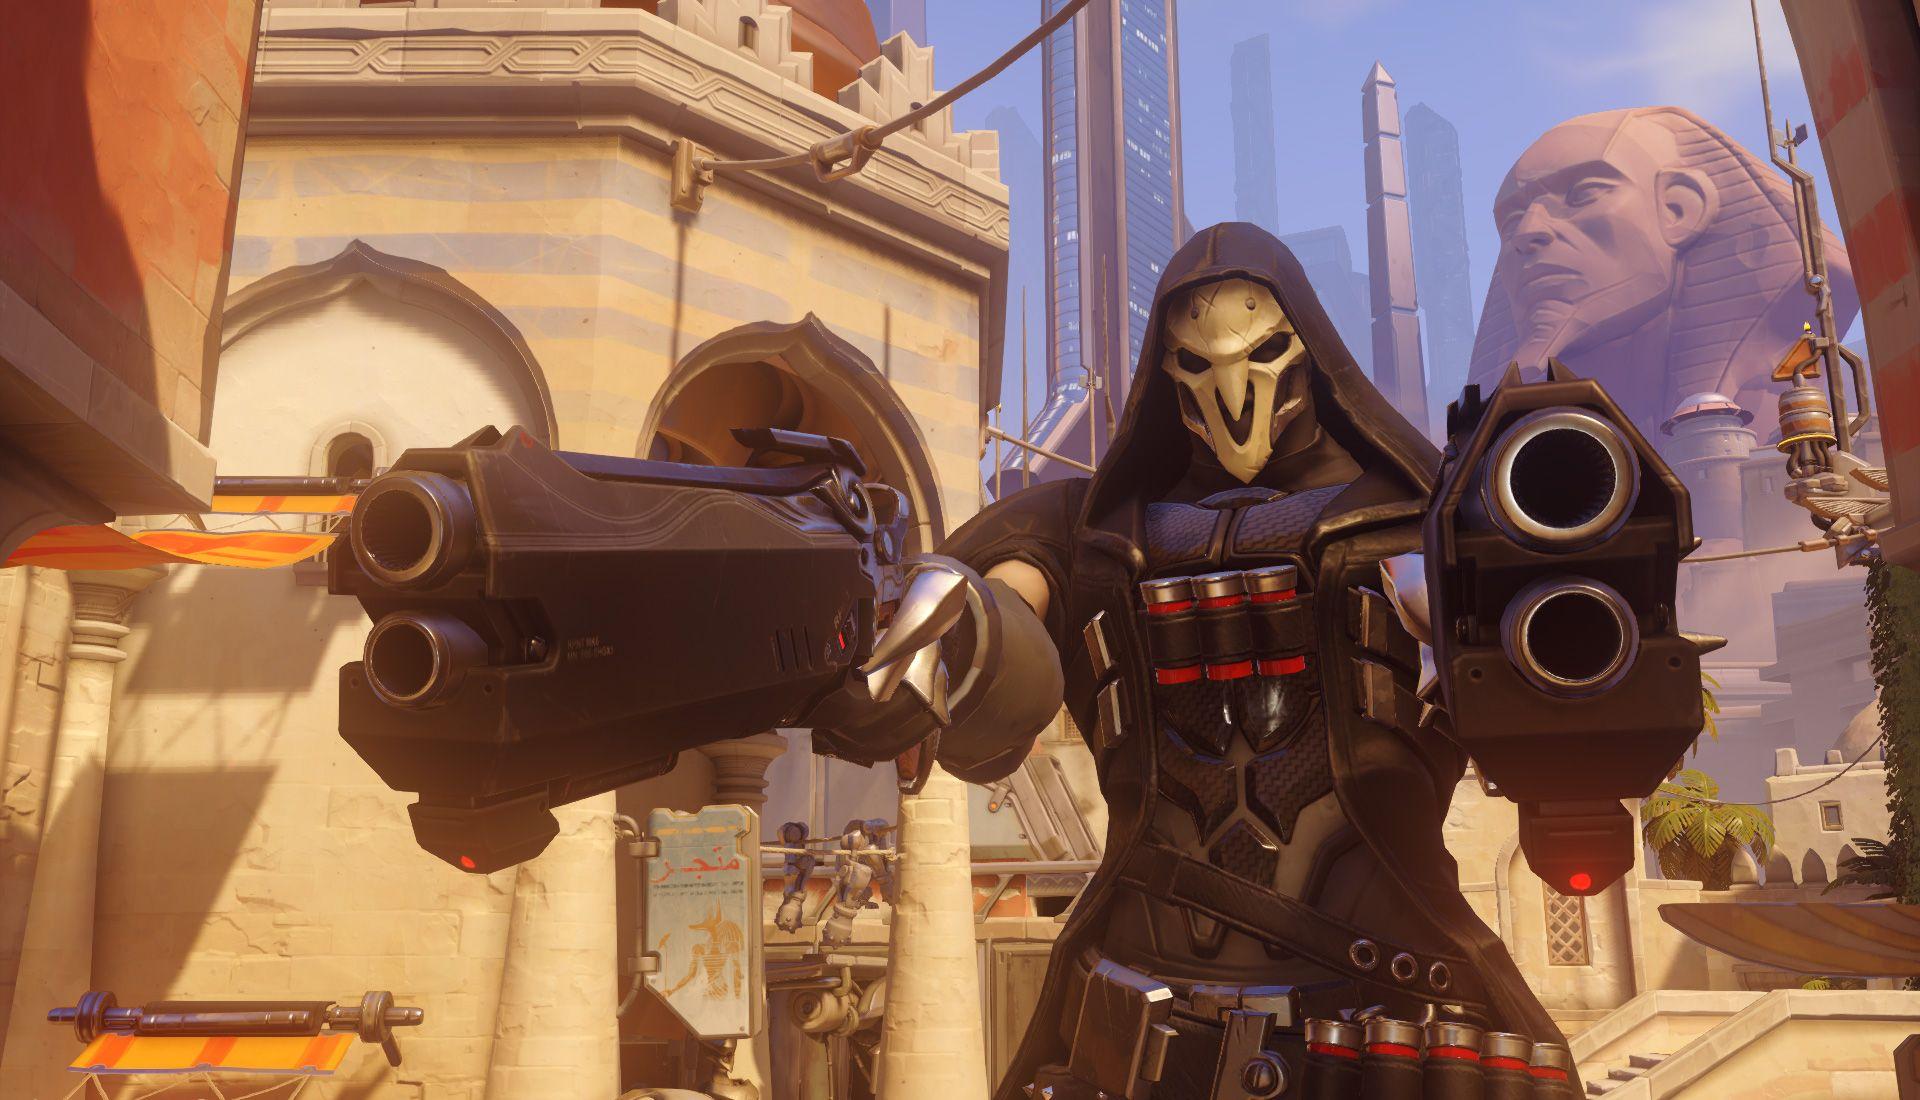 Reaper lore